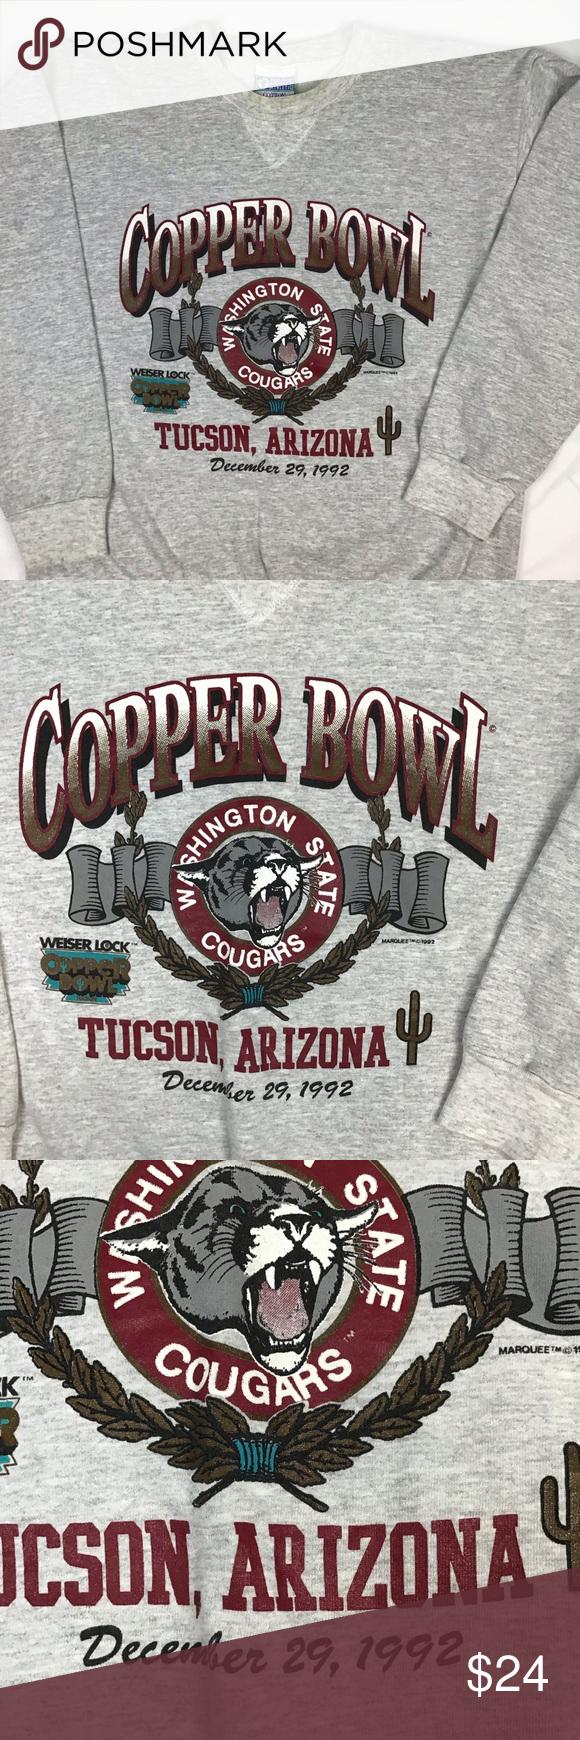 VTG WSU 92 Copper bowl crewneck in 2020 Crew neck